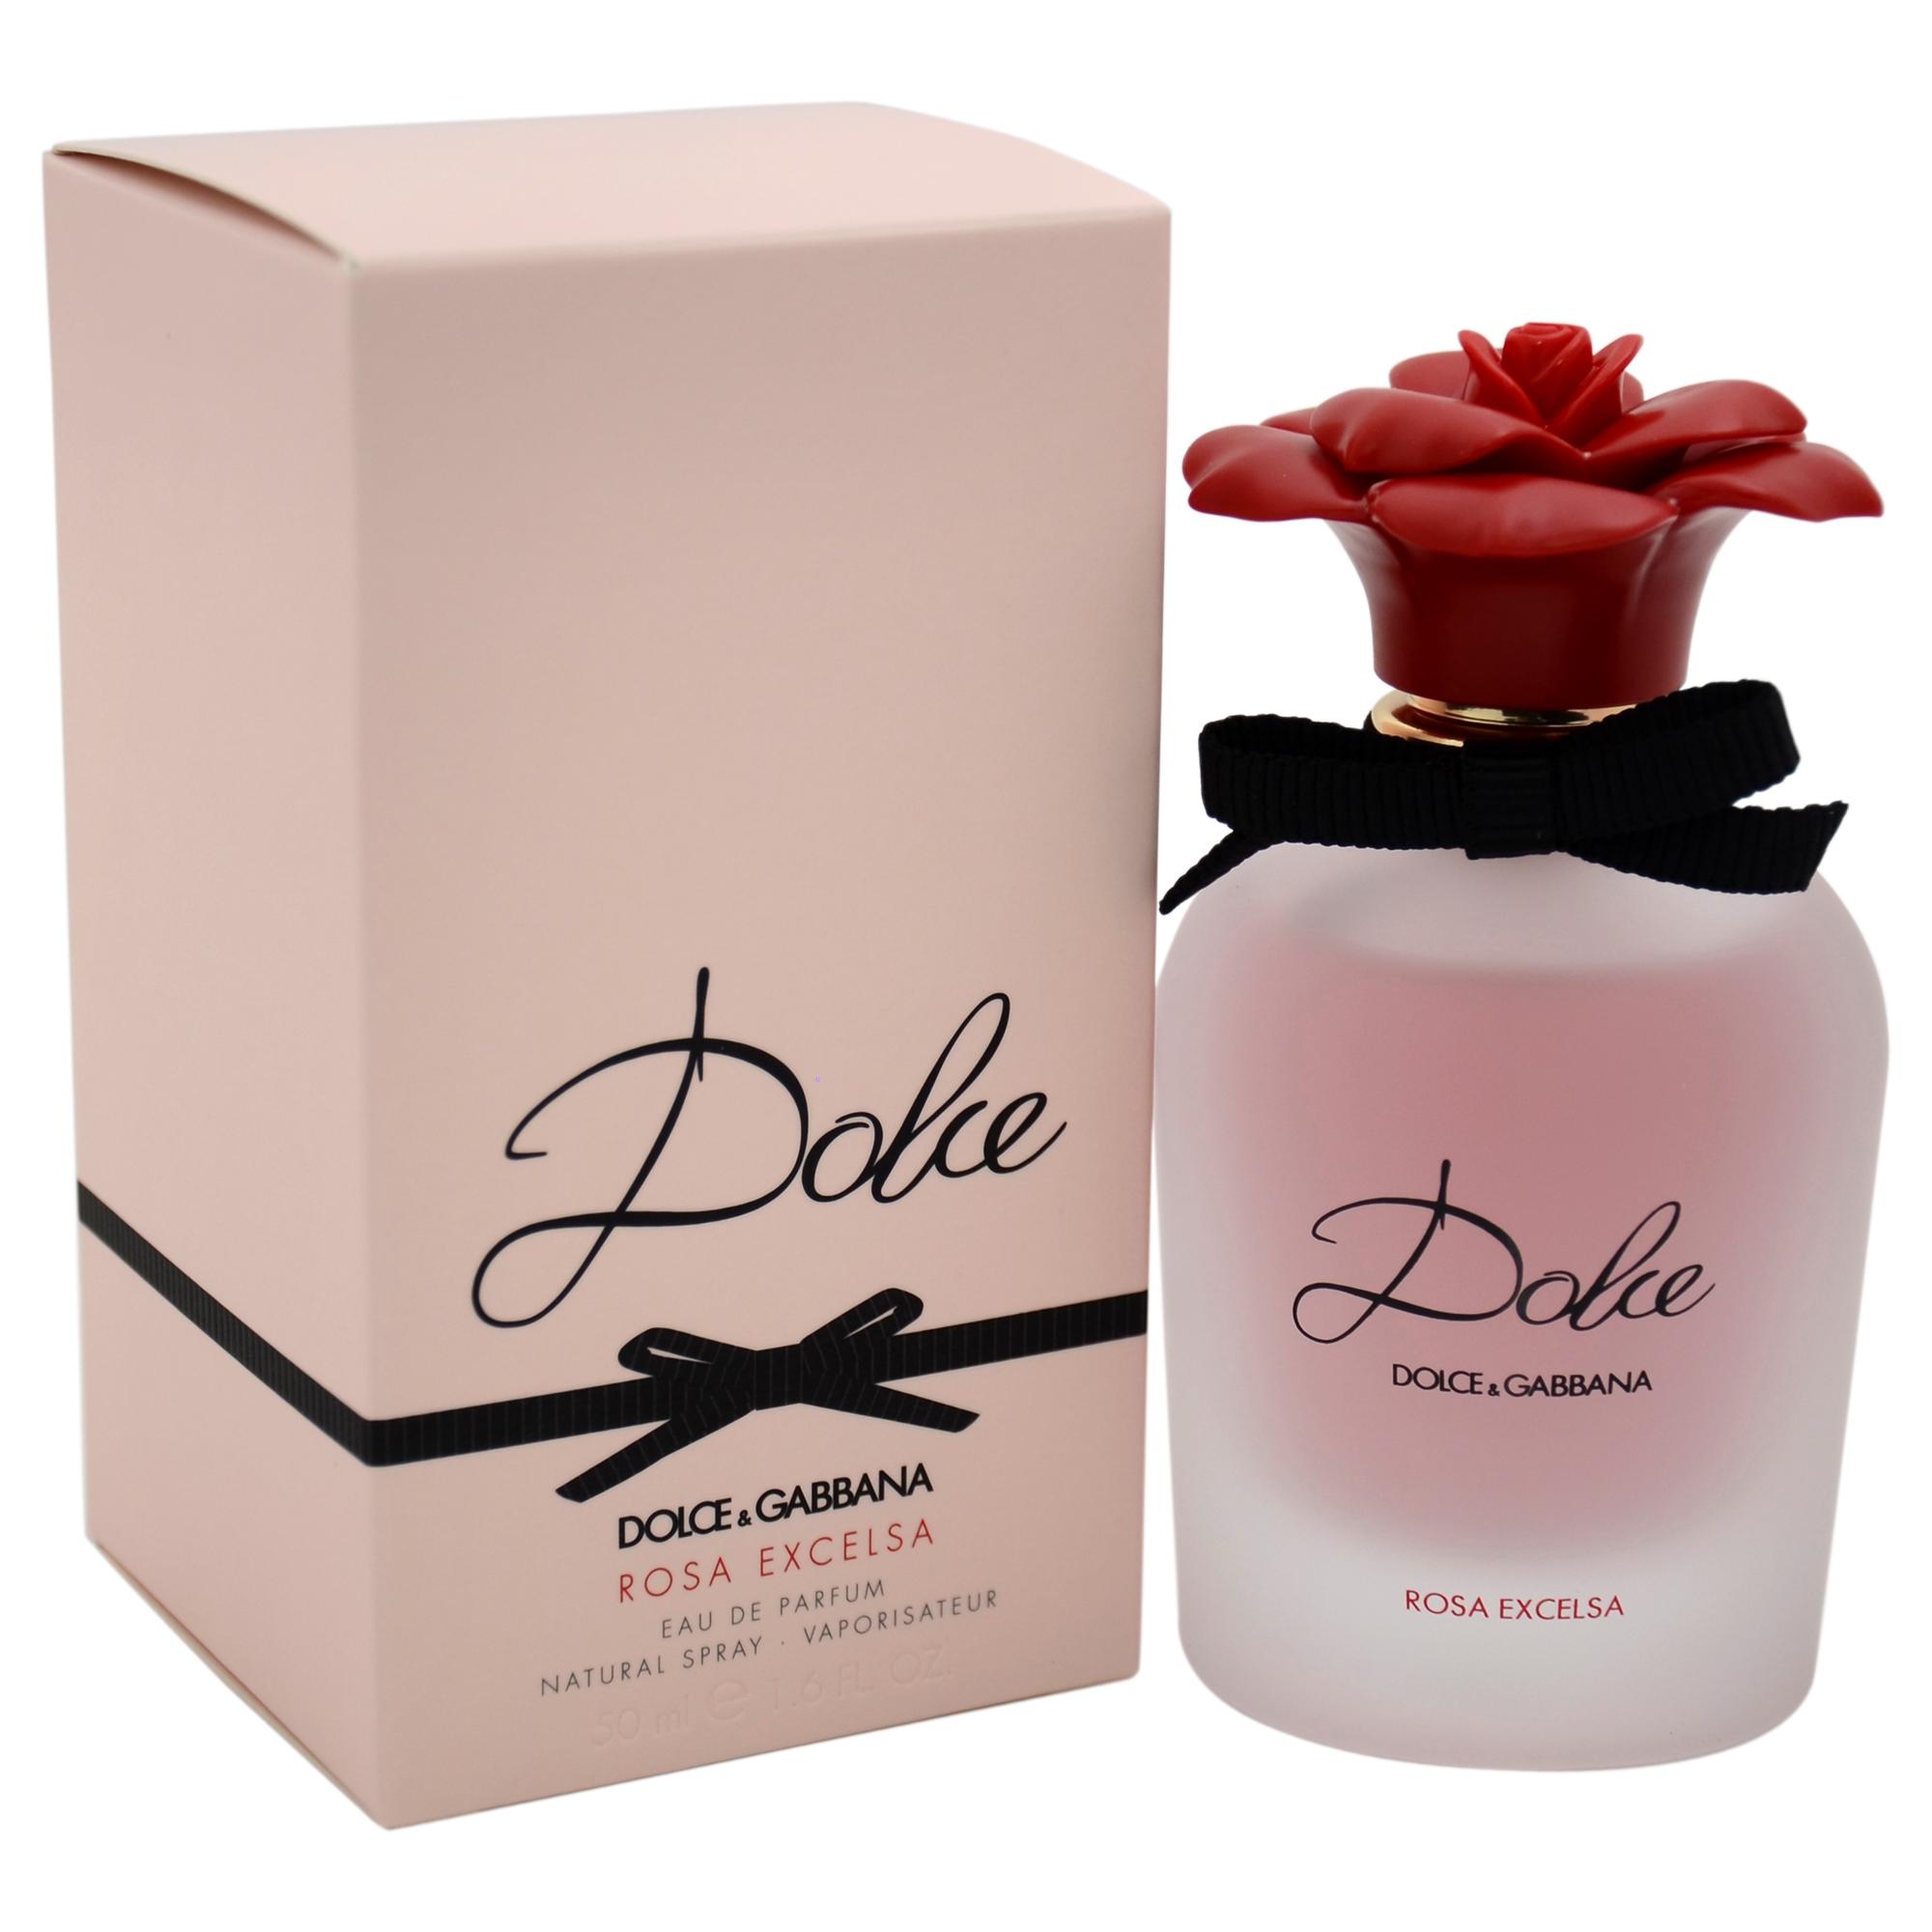 Dolce Rosa Ecelsa by Dolce & Gabbana for Women - 1.6 oz EDP Spray